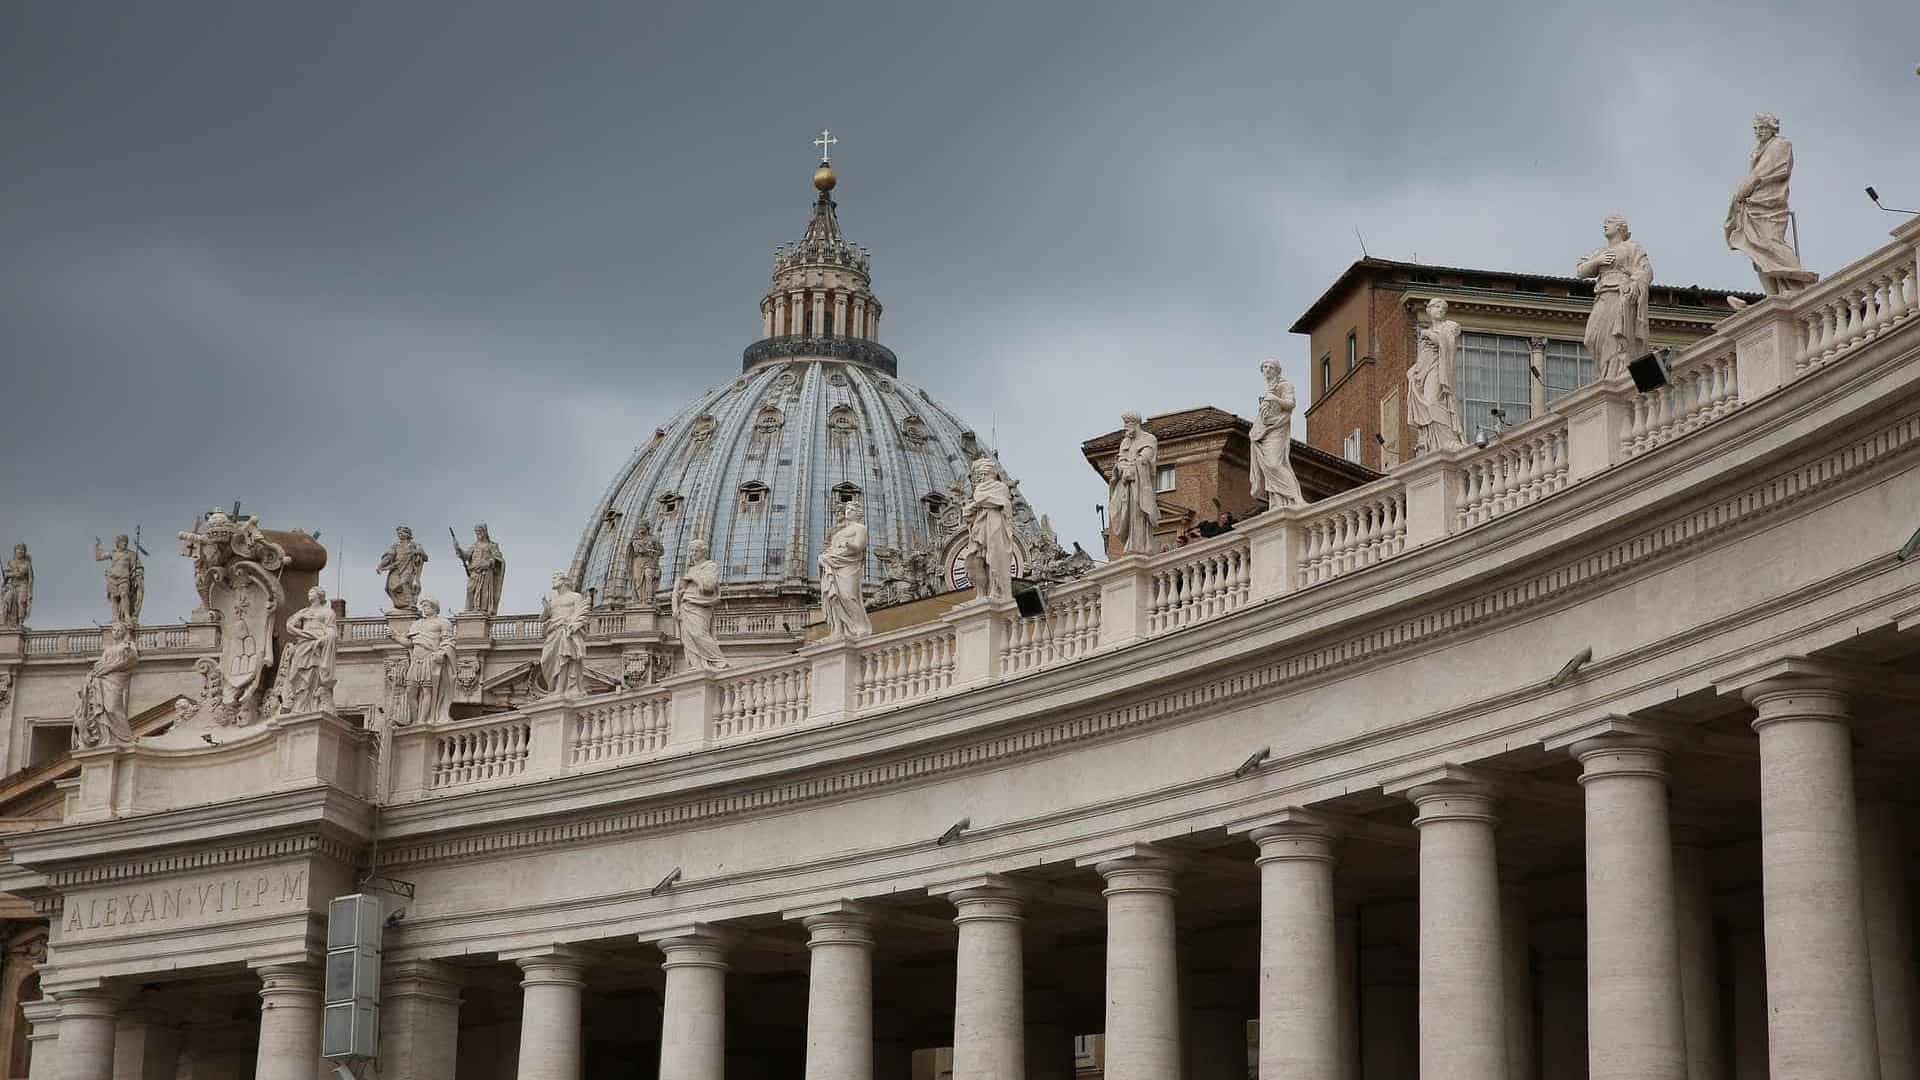 Tribunal condena arcebispo de Guam após julgamento sobre abusos sexuais — Vaticano